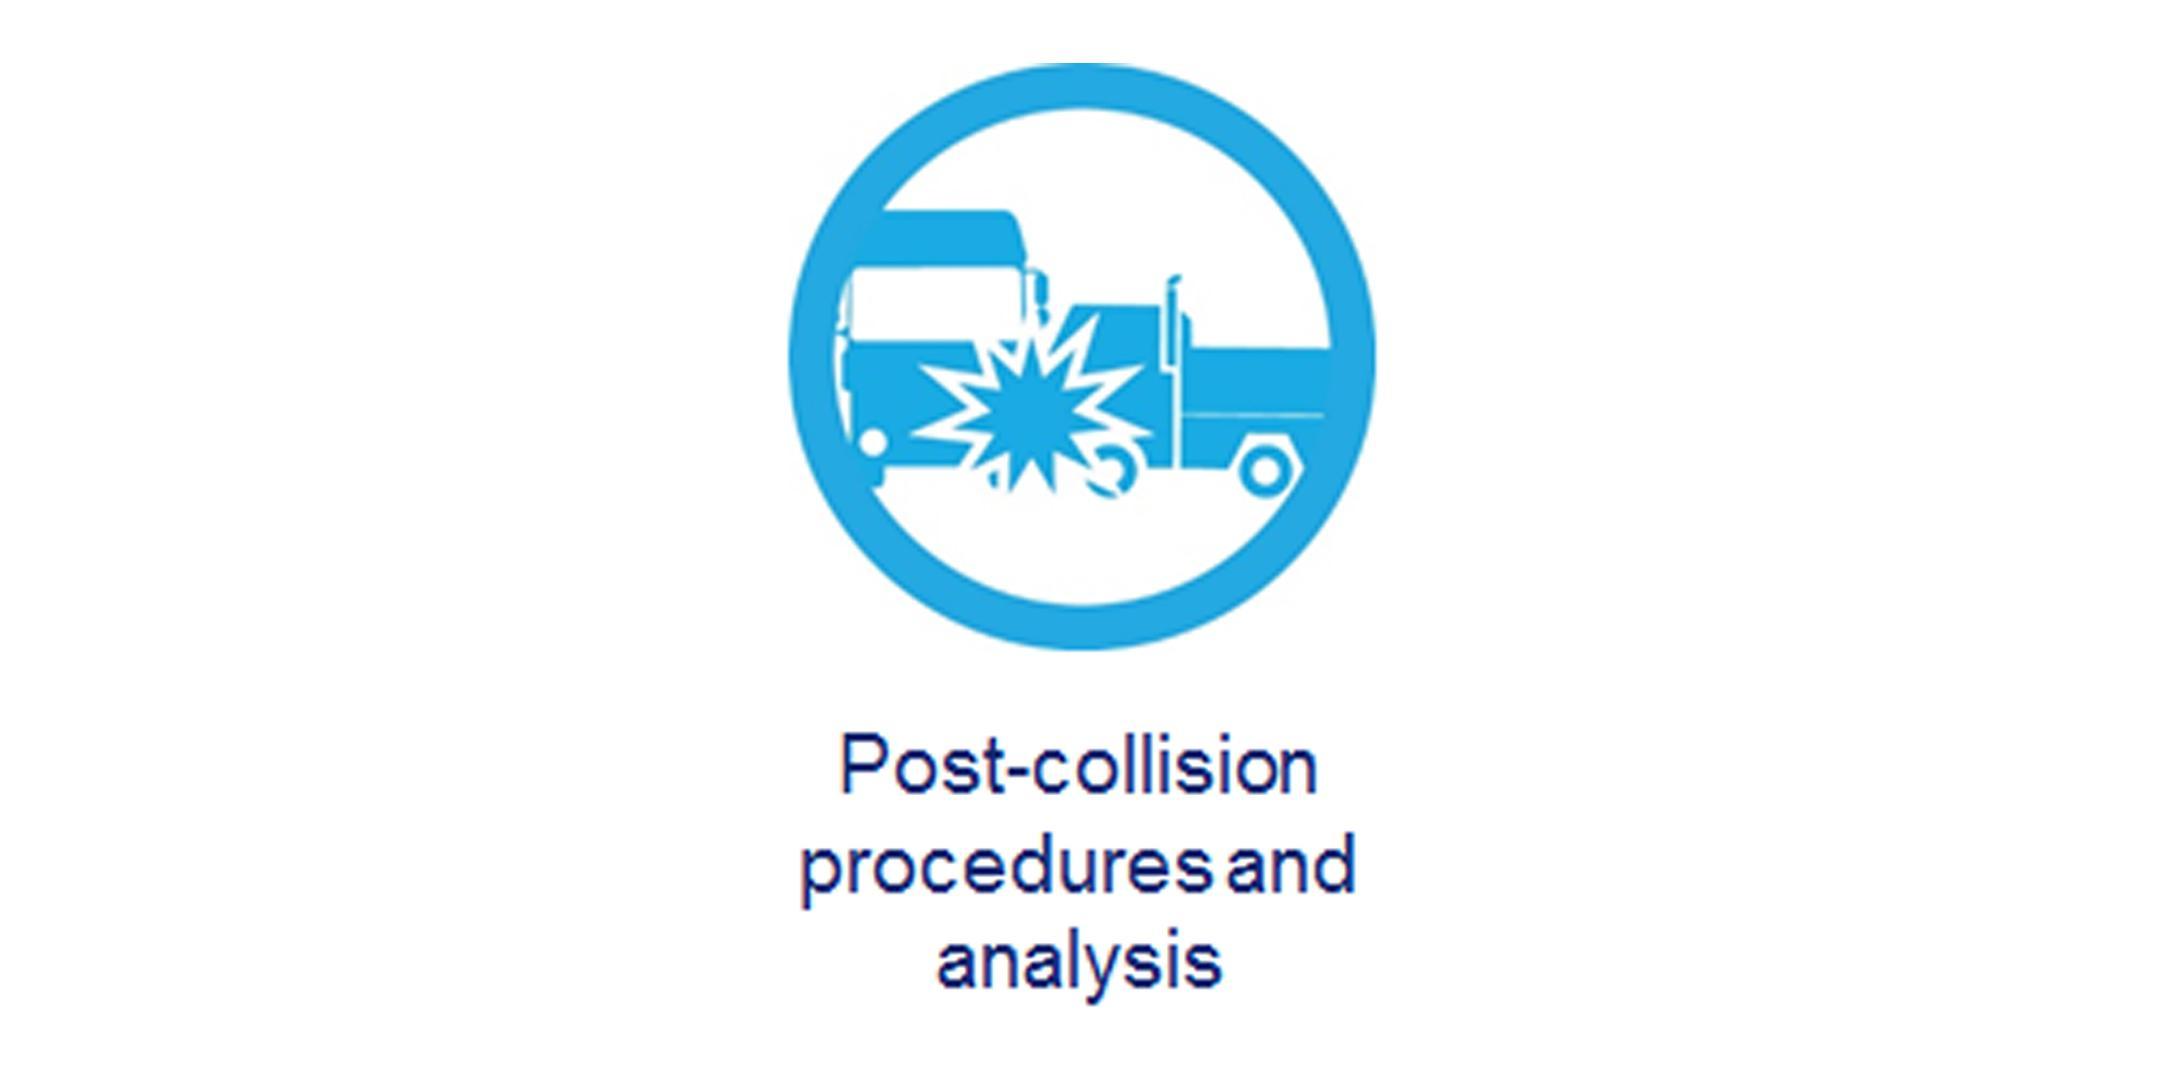 5 - Collision Procedures and Analysis - Newcastle-upon-Tyne